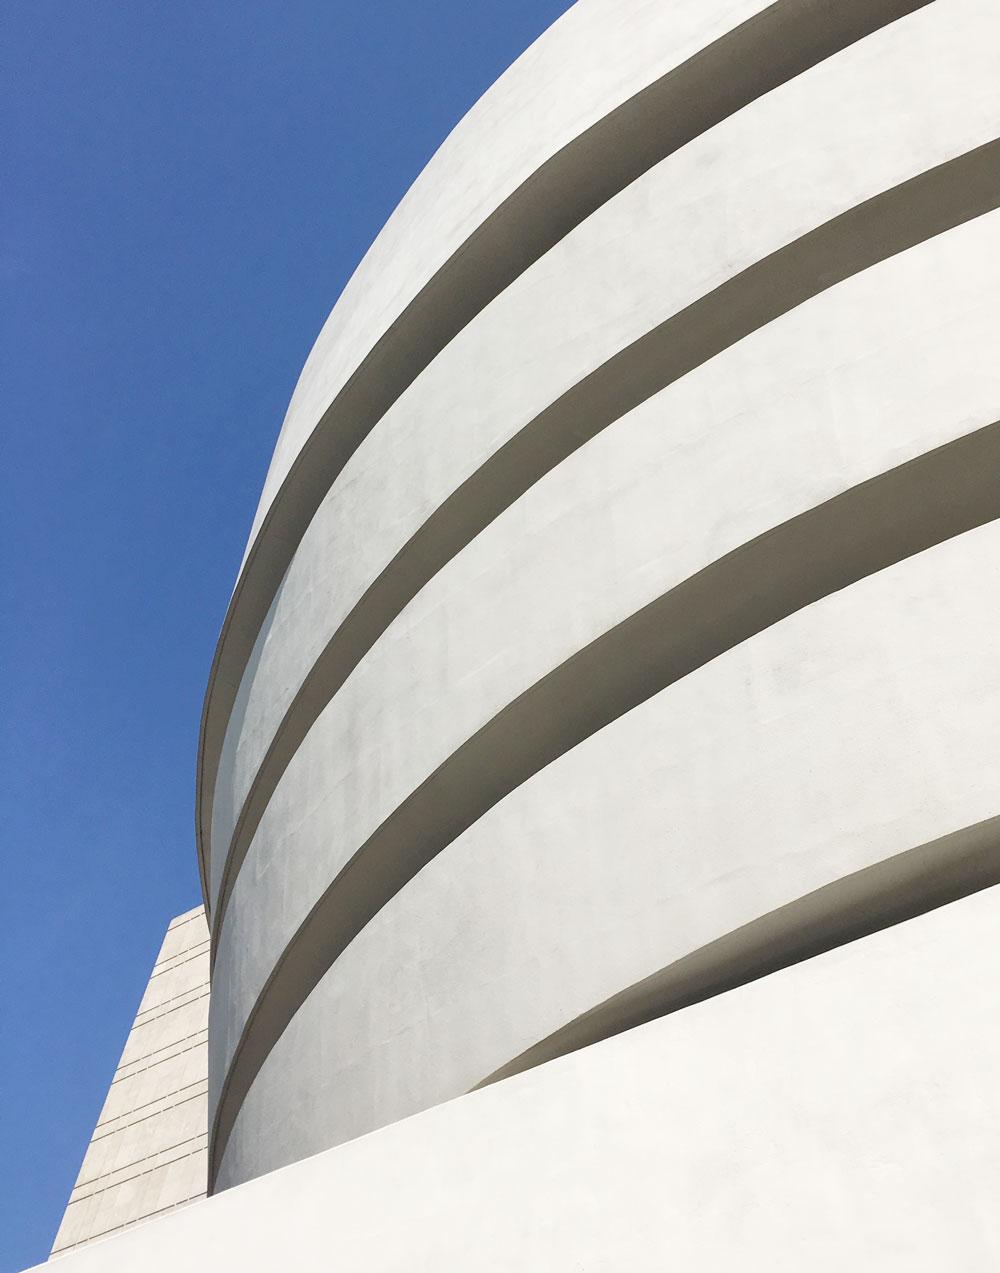 Guggenheim Museum, New York #mustseeinNewYork #museumsofNewYork #thingstodoinnewyork